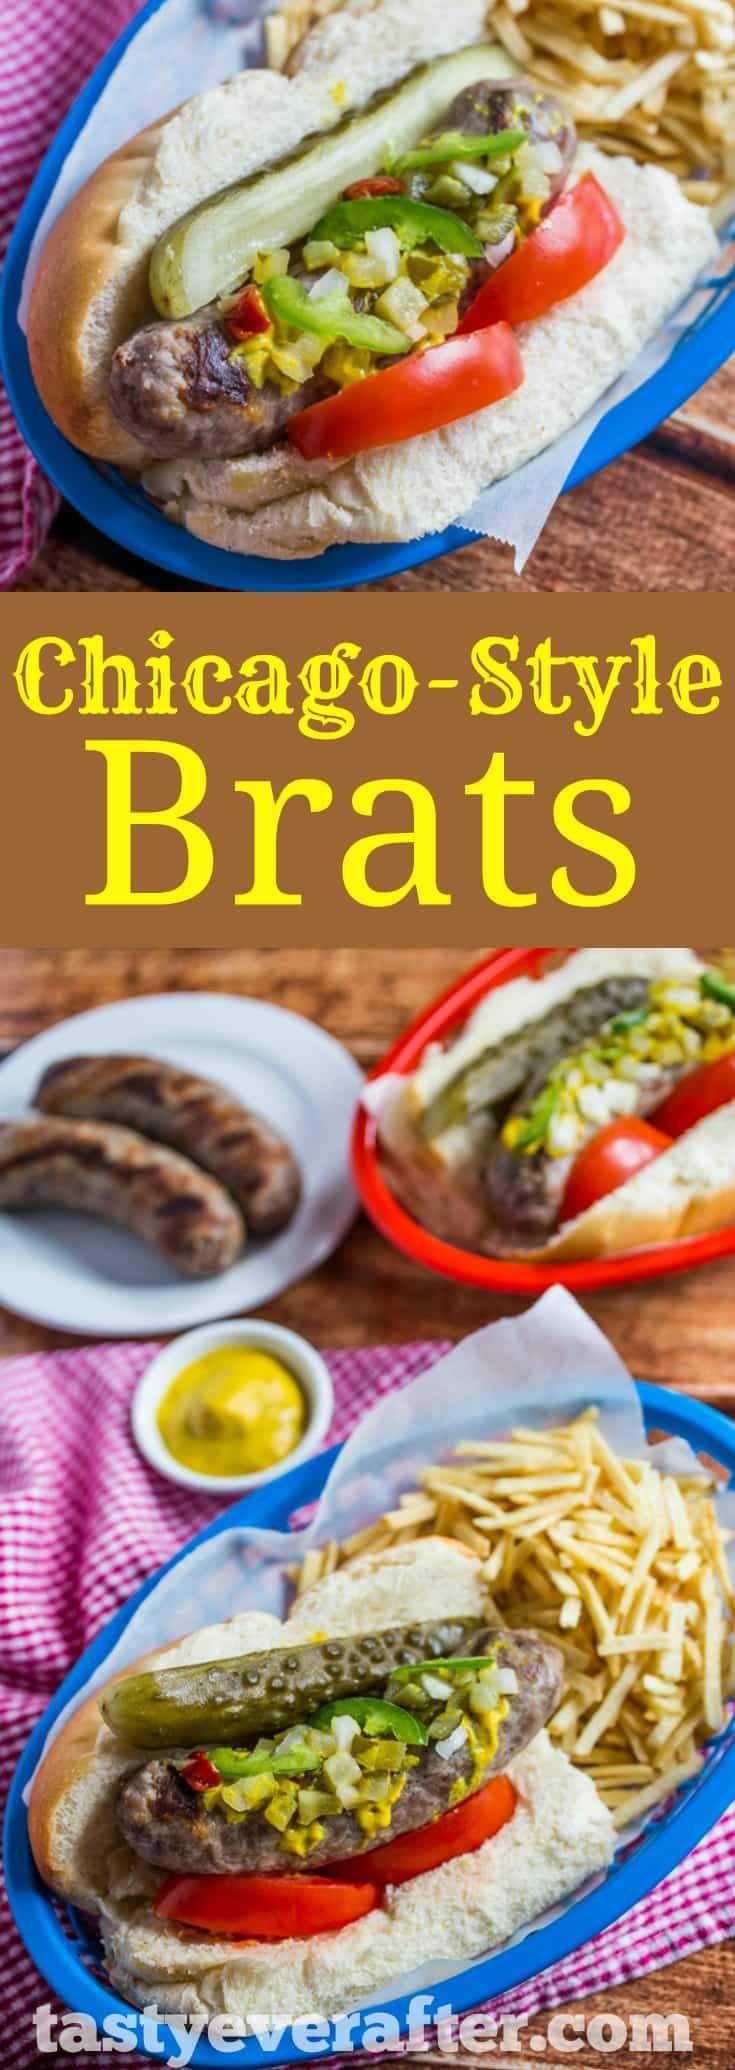 Chicagostyle brats recipe brats recipes food recipes